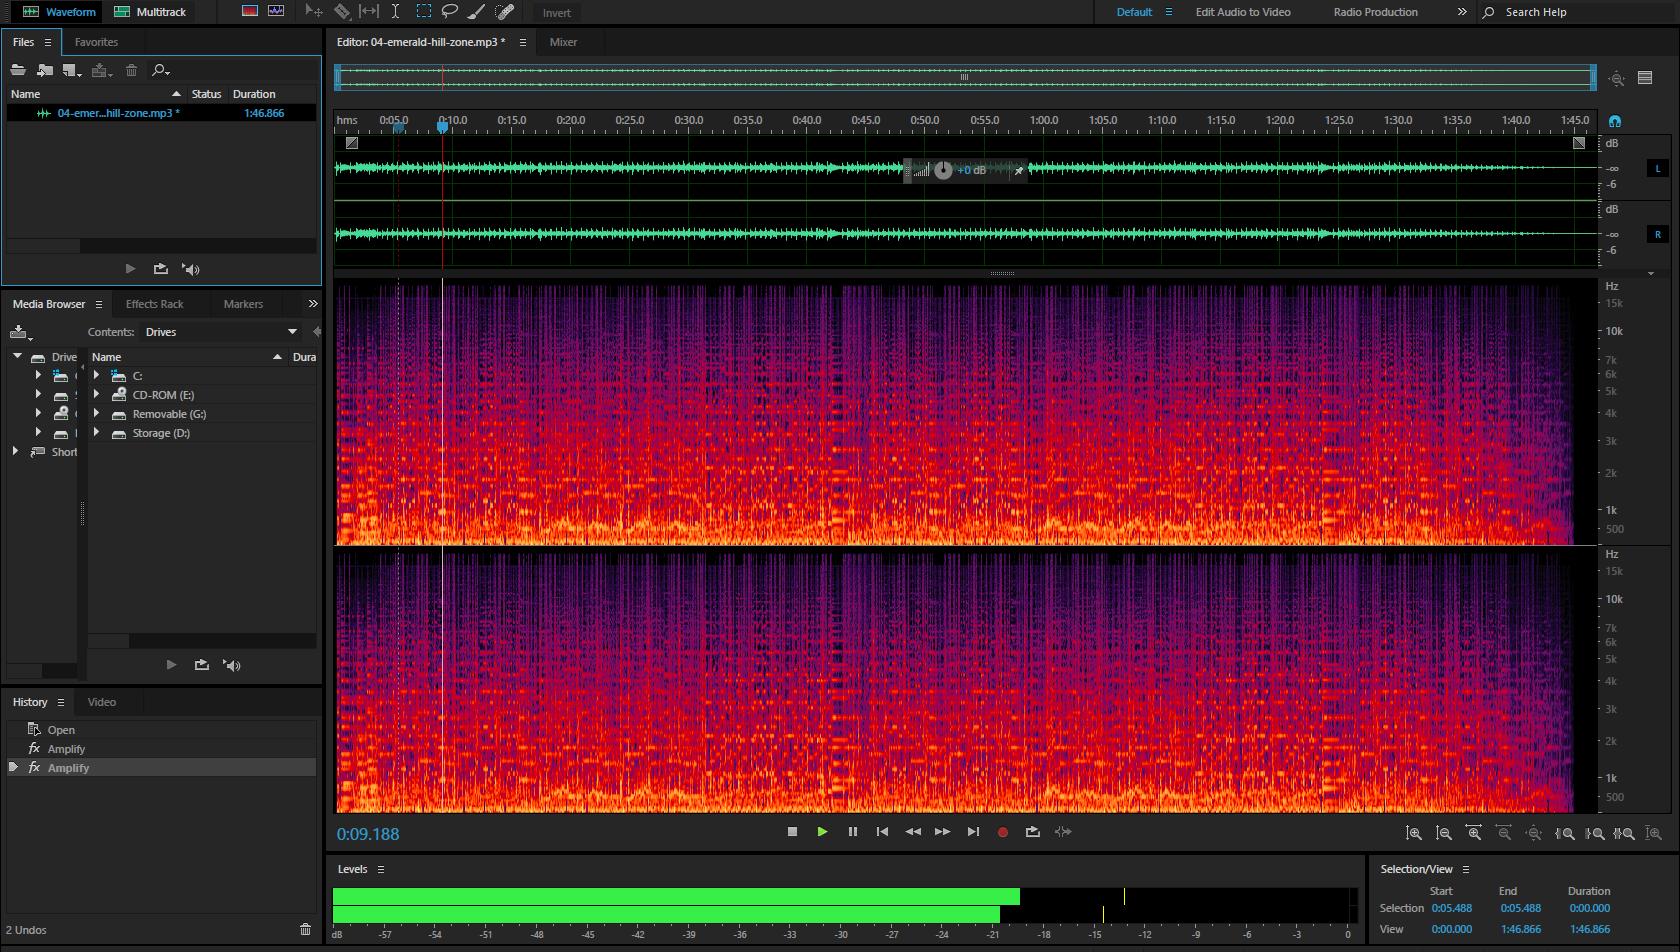 I will provide professional audio editing